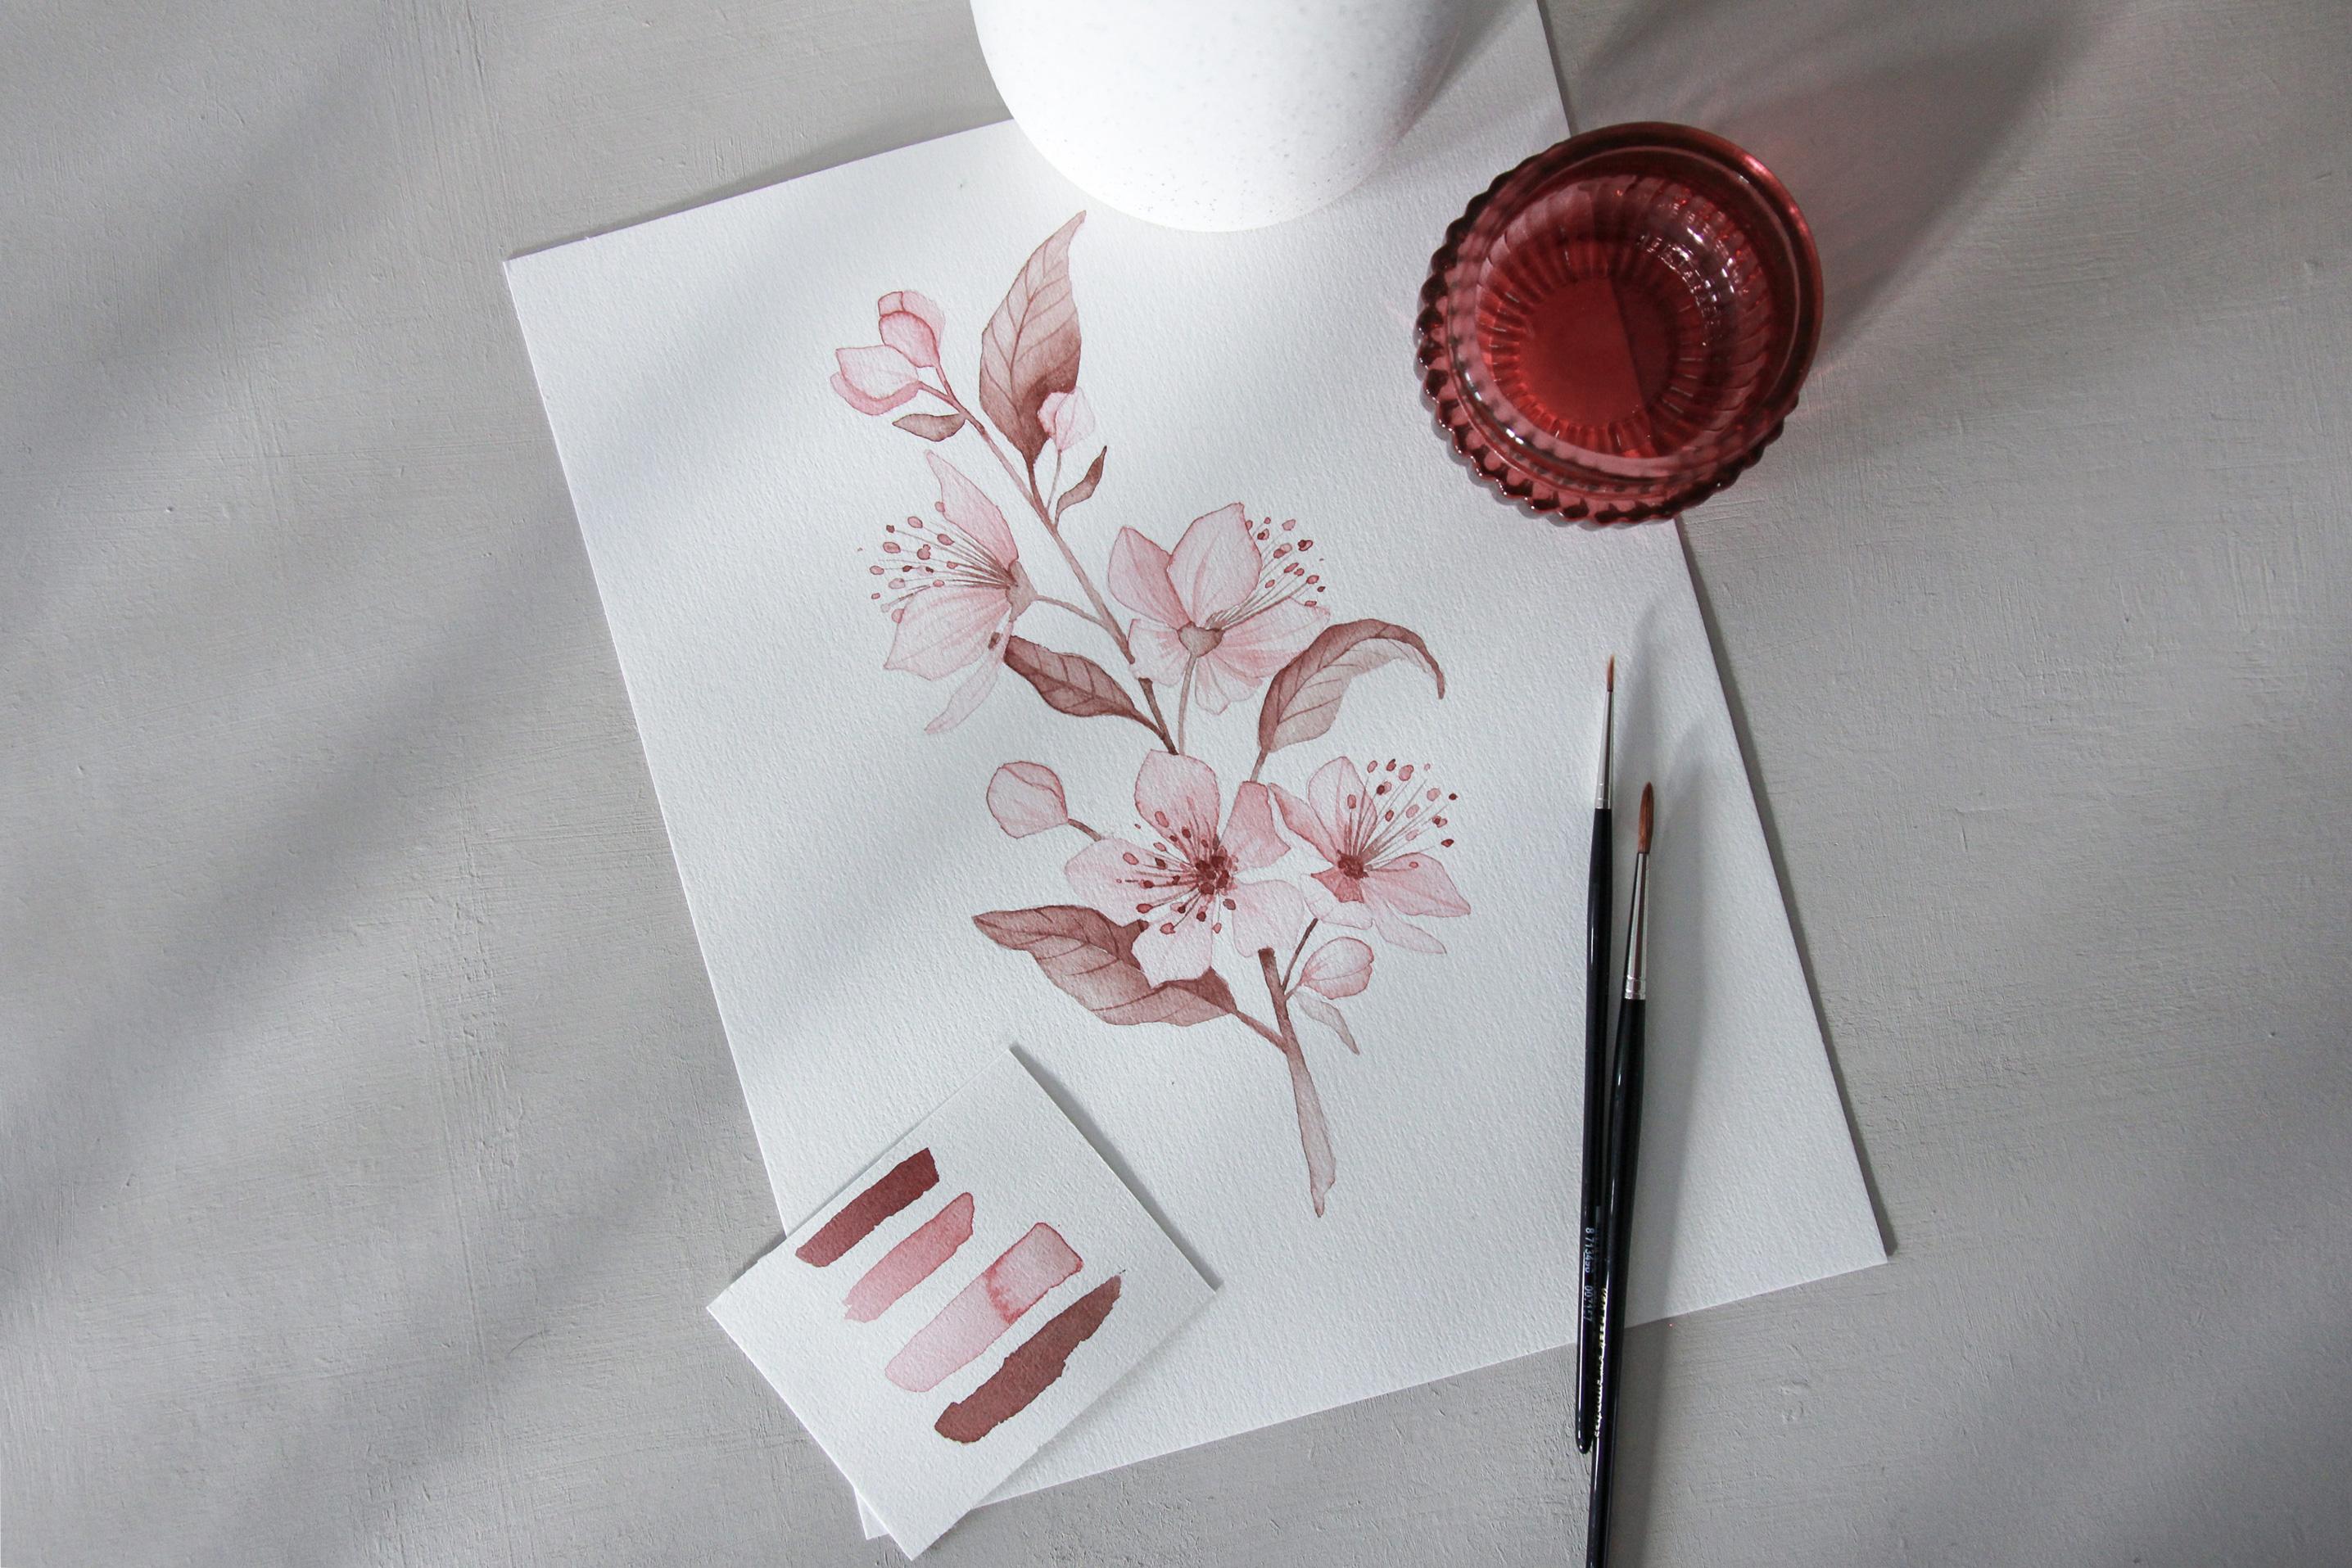 Spring Blossom watercolors - Bloom Creatives art classes